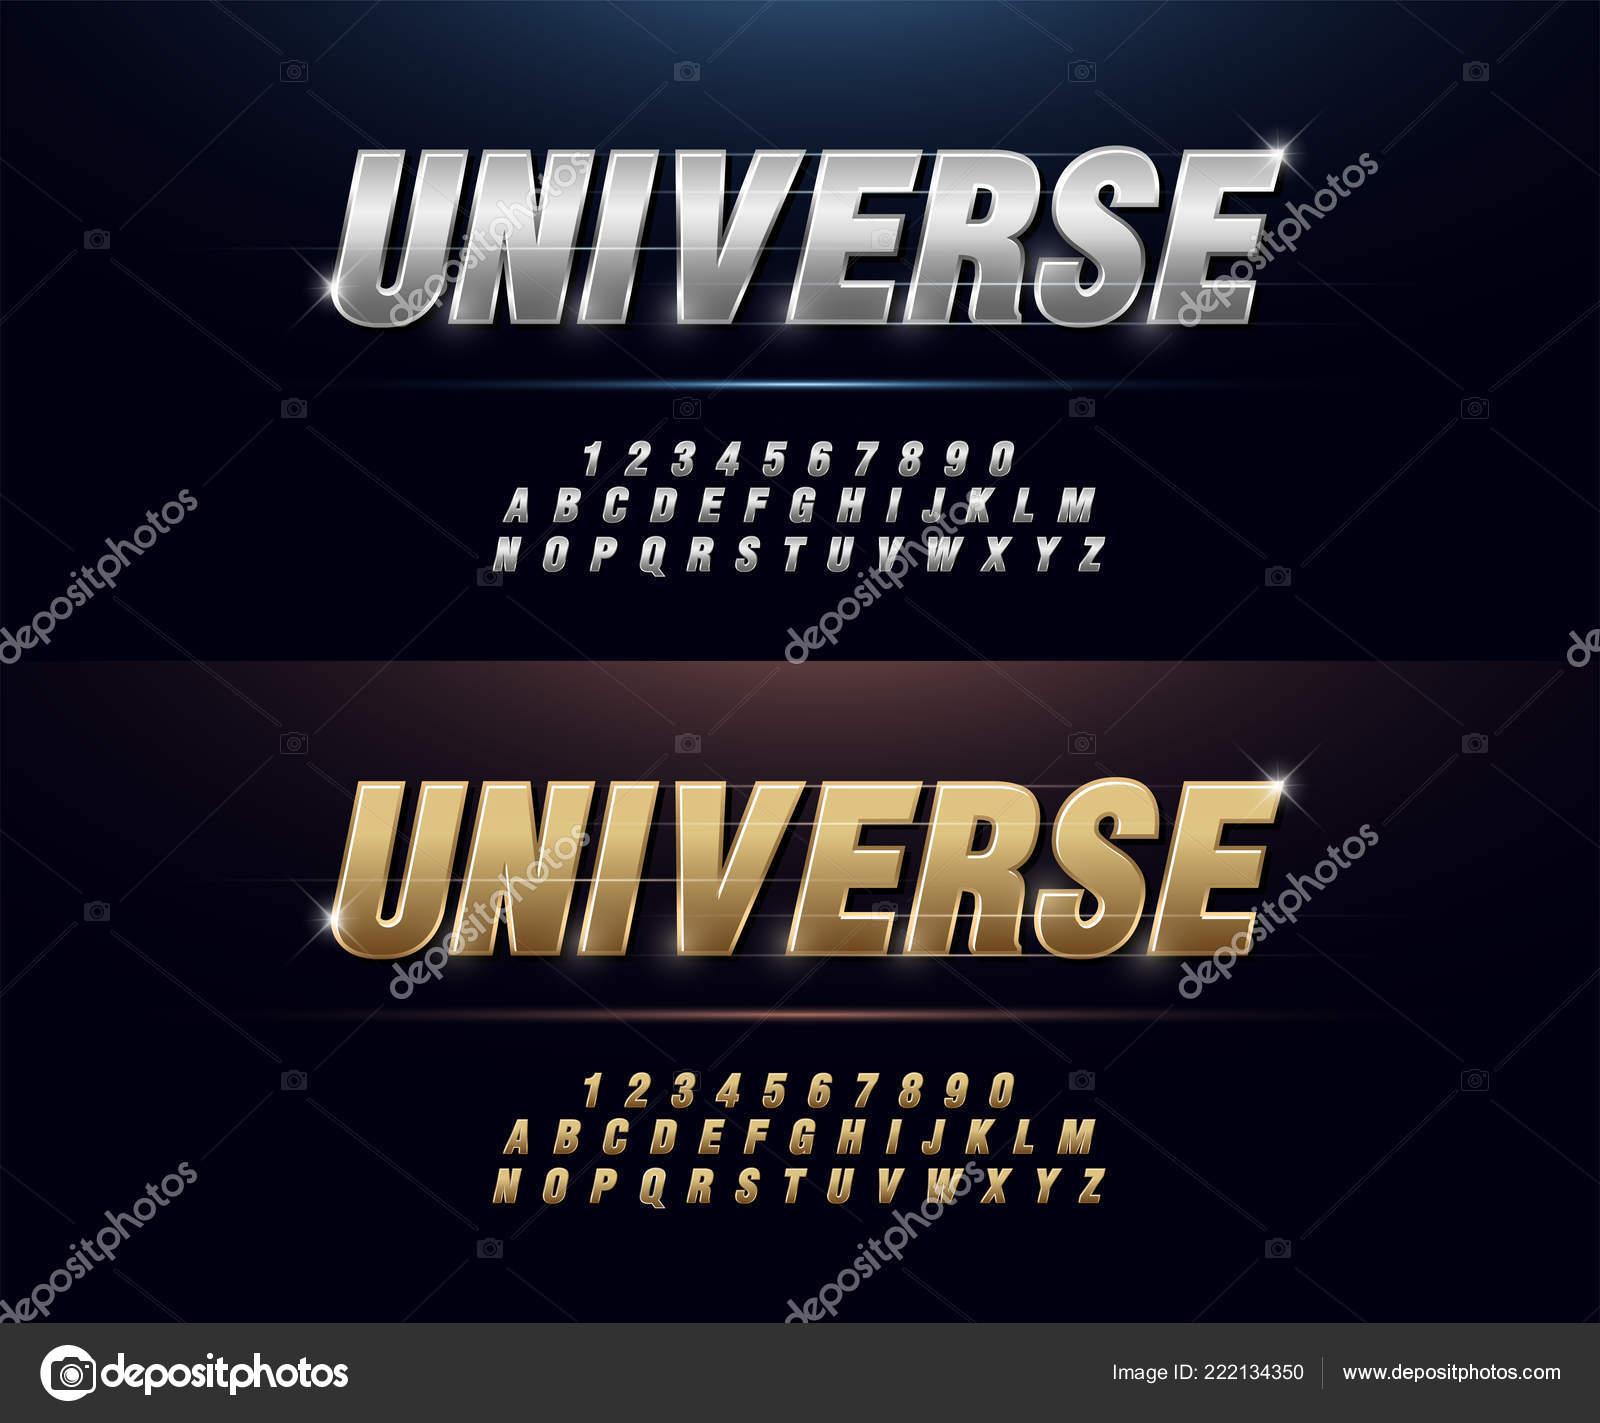 Elegant Silver Golden Colored Metal Chrome Alphabet Font Typography